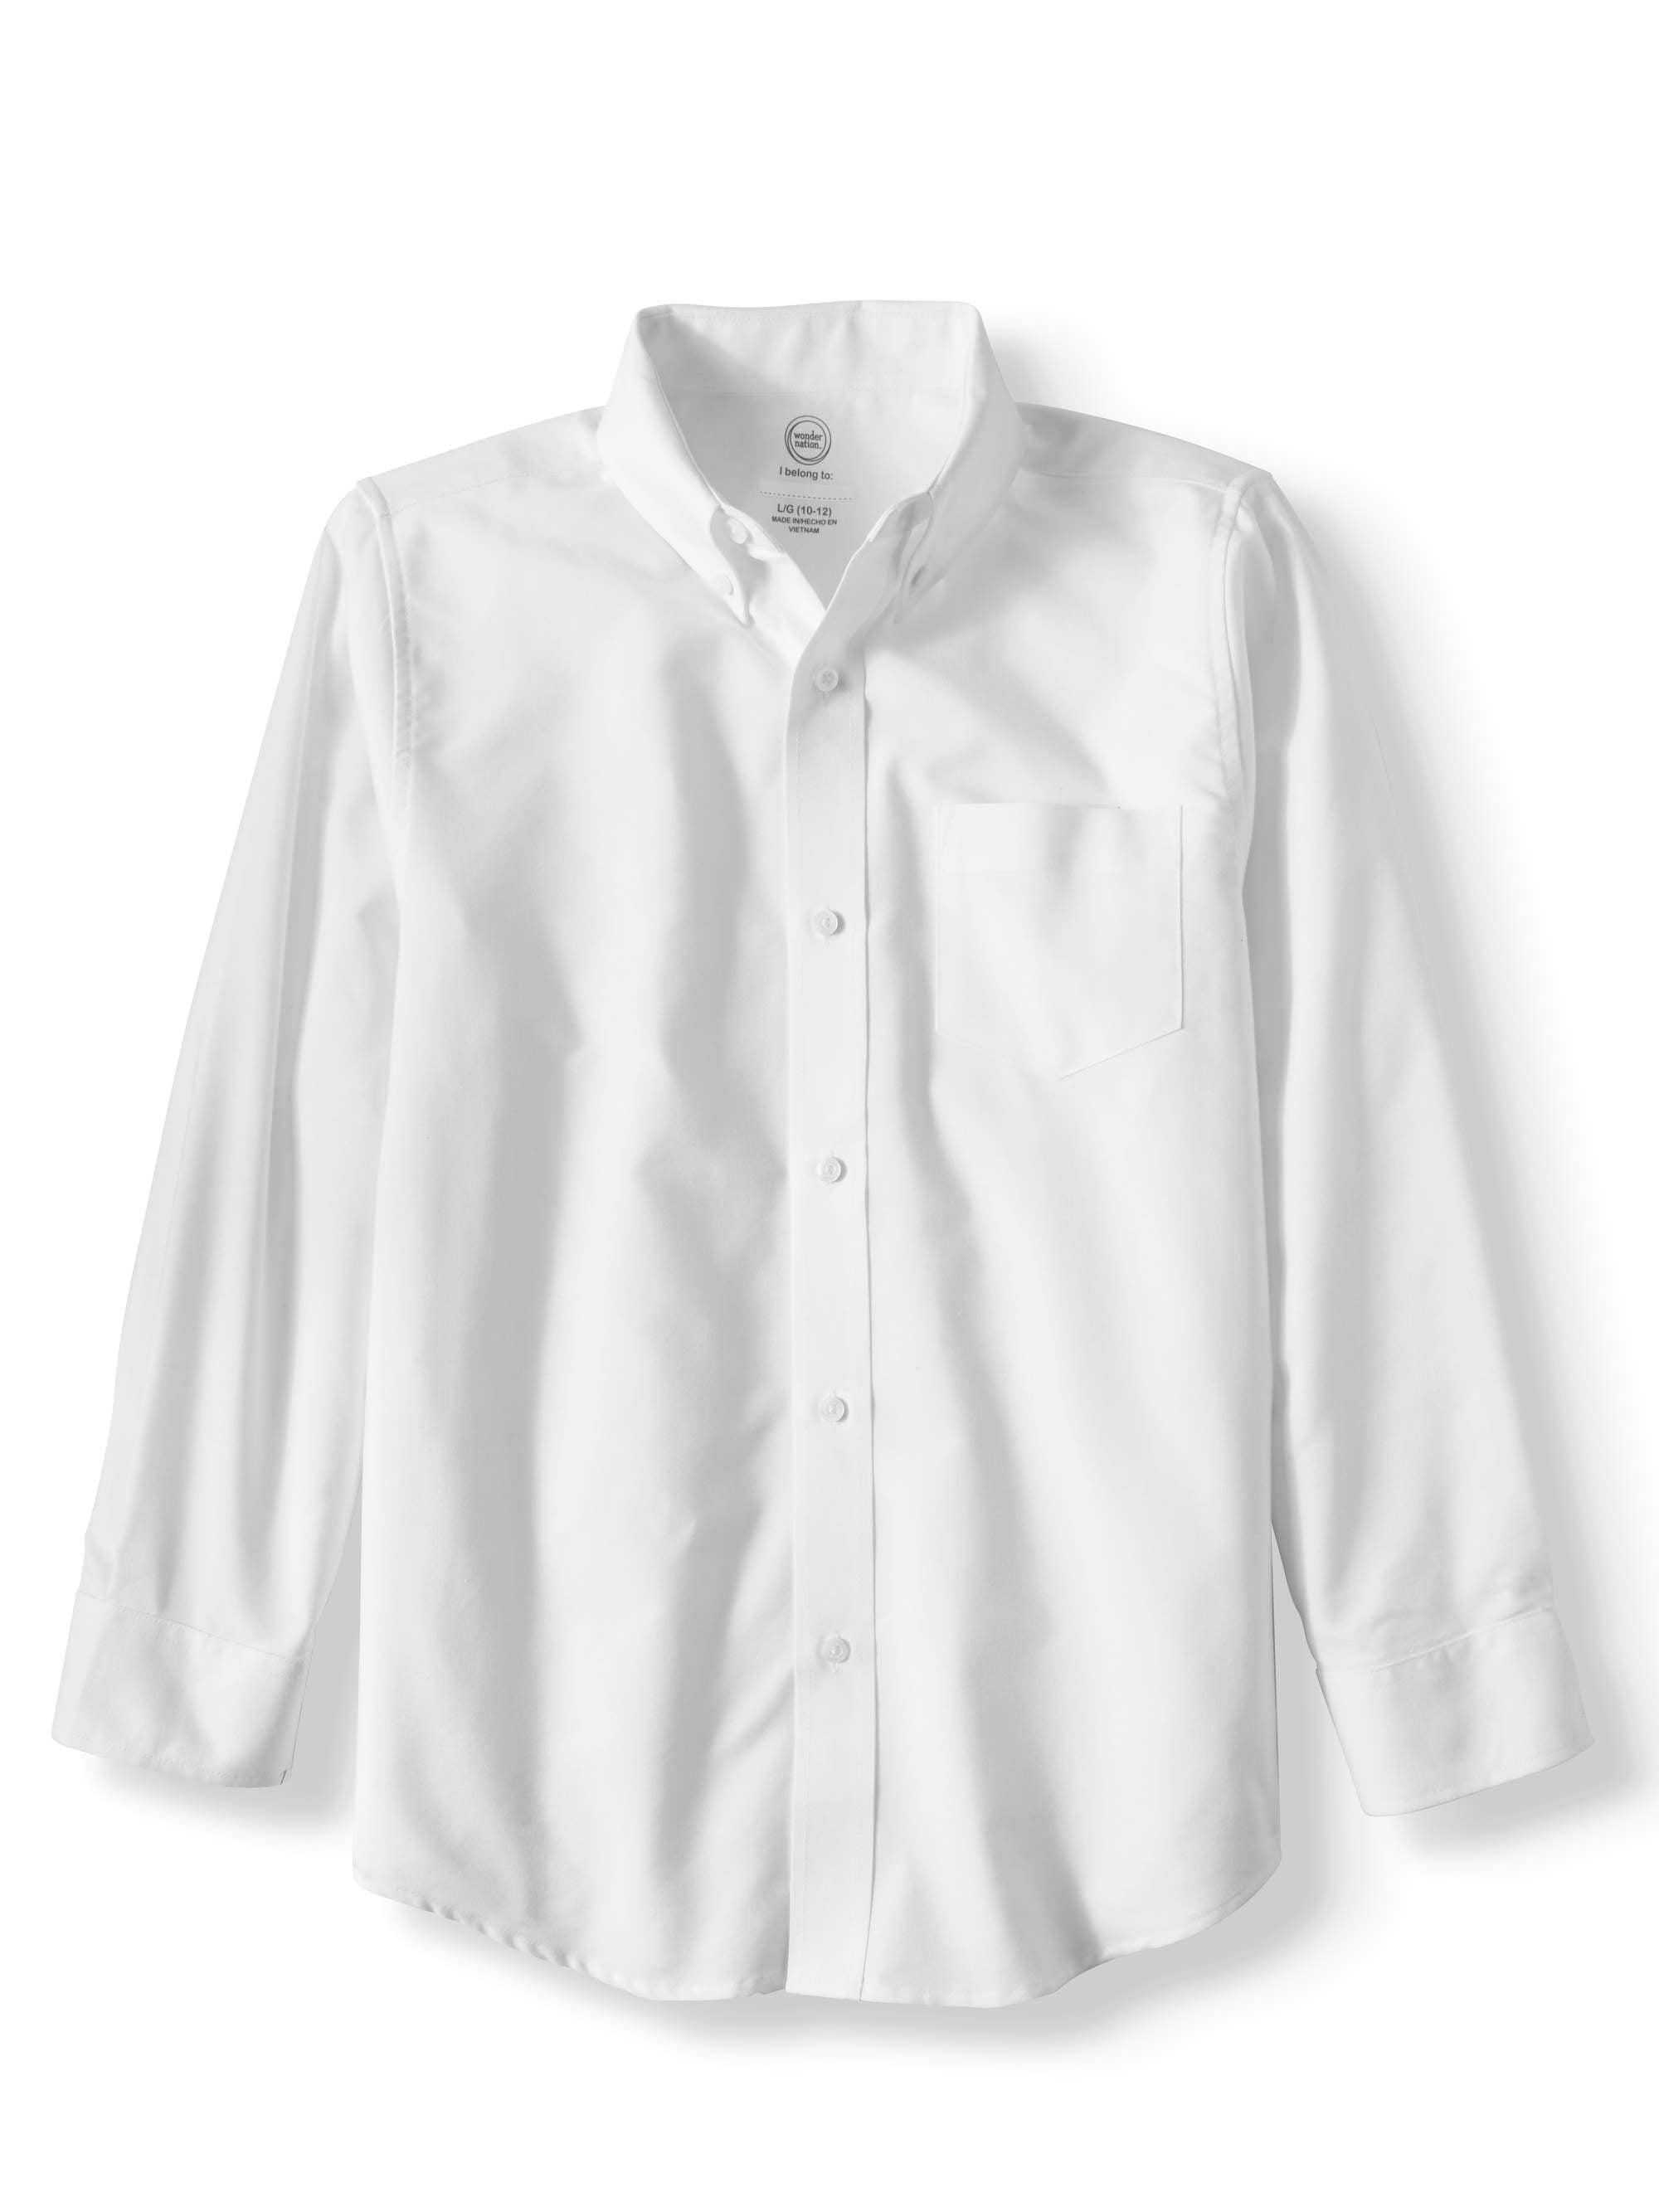 Nautica Boys Big School Uniform Short Sleeve Oxford Shirt